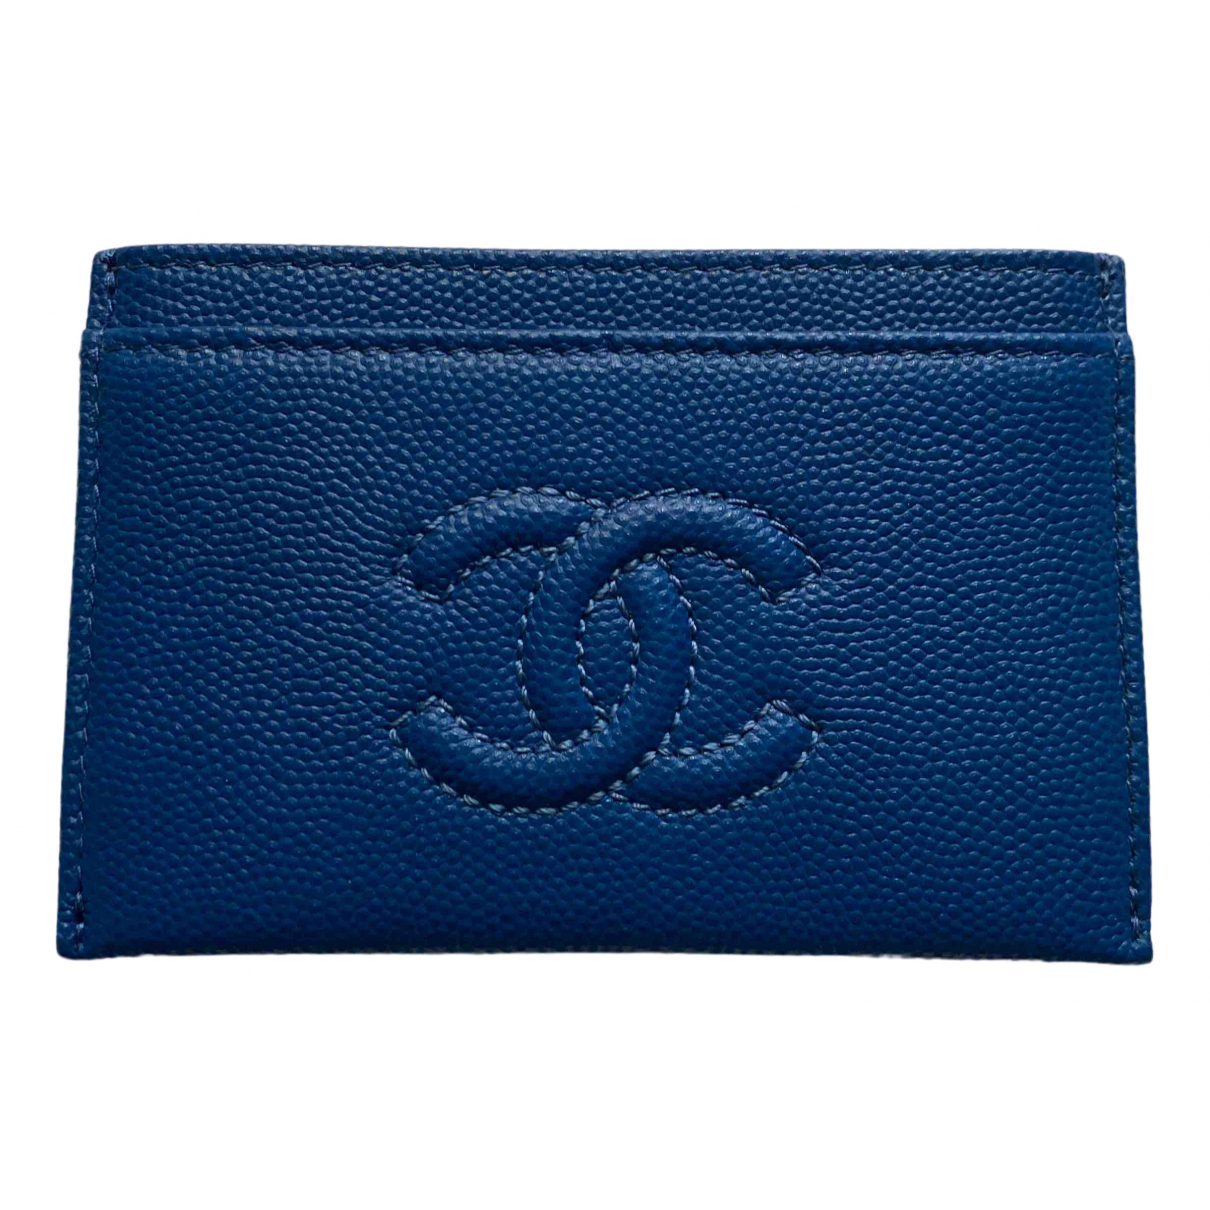 Chanel \N Kleinlederwaren in  Blau Leder